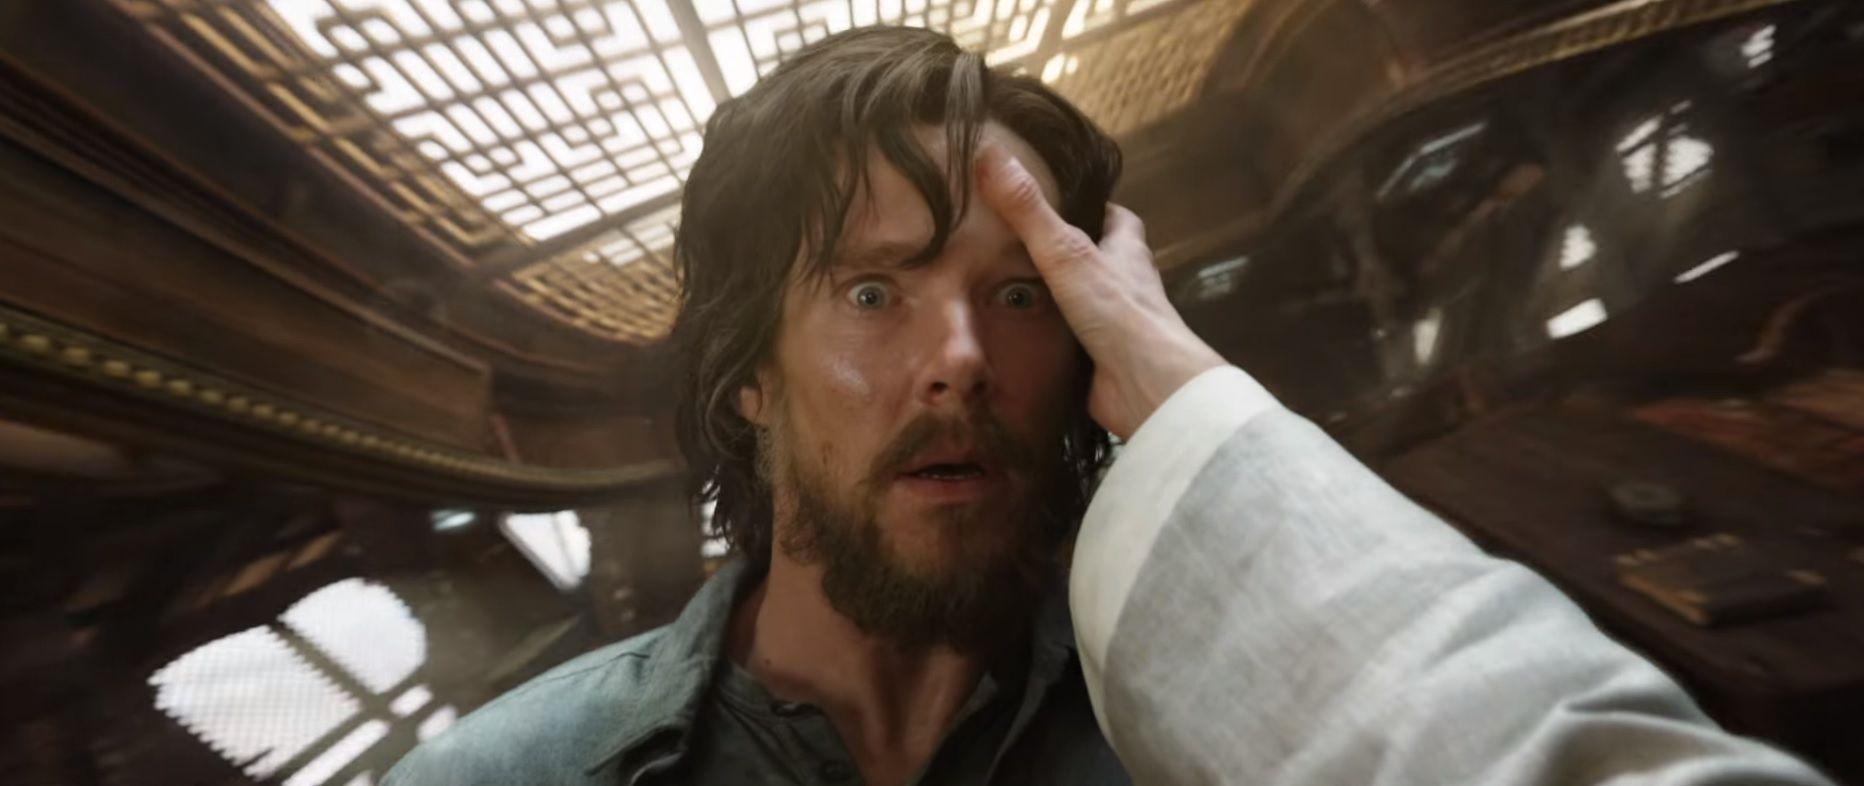 'Doctor Strange' Becomes Marvel's Highest-Grossing Solo Superhero Introduction